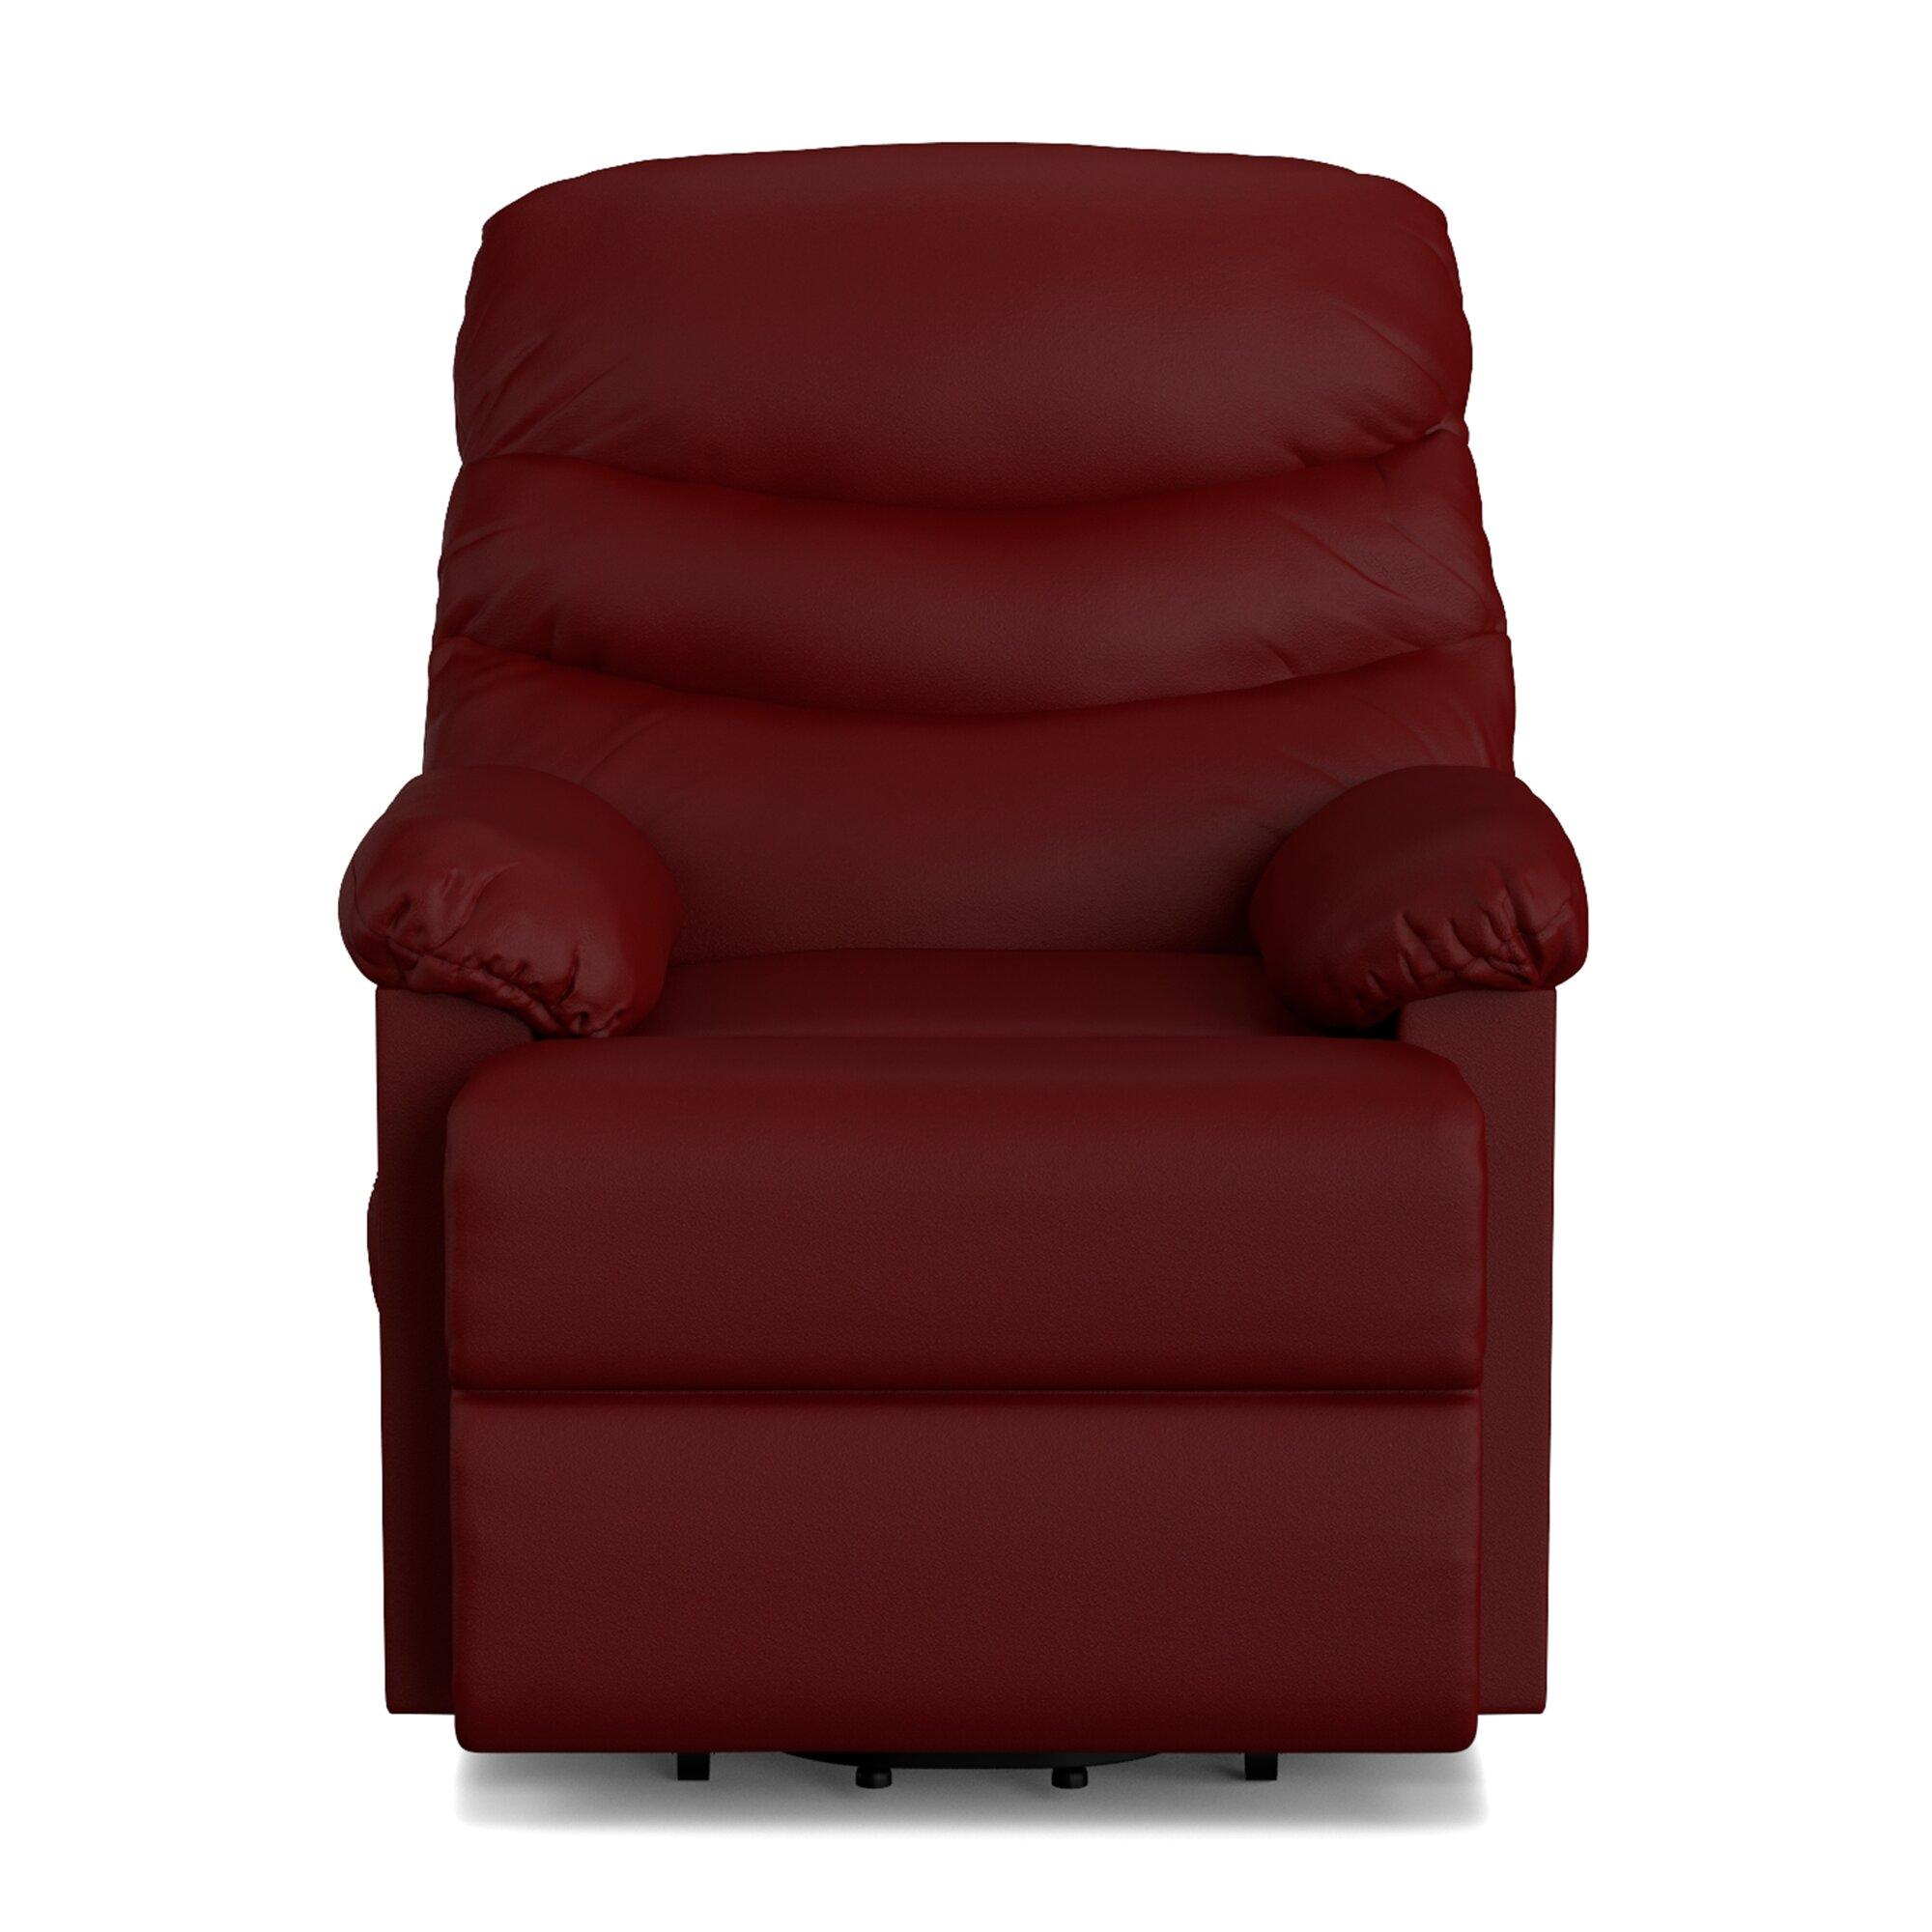 infinite position wall hugger lift chair